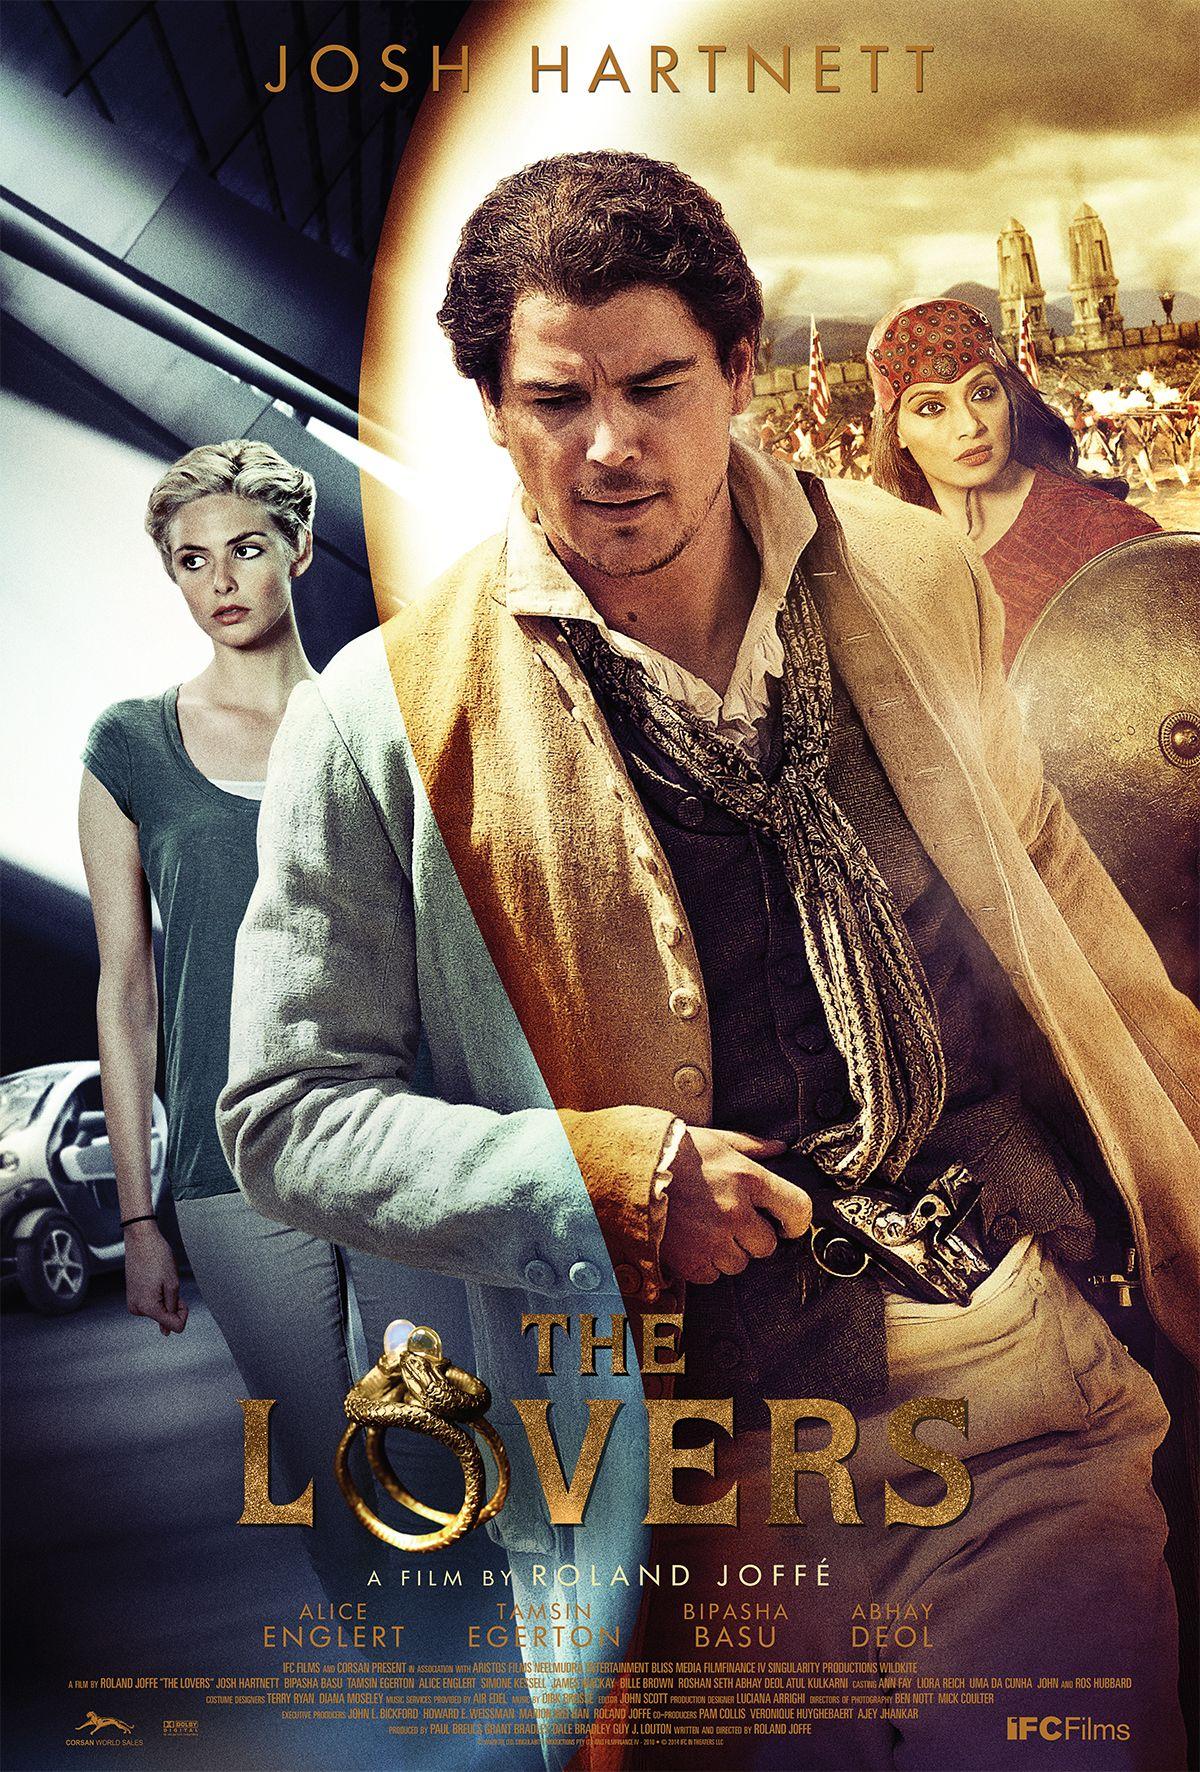 The Lovers 2015 Josh Hartnett Film Free Movies Online